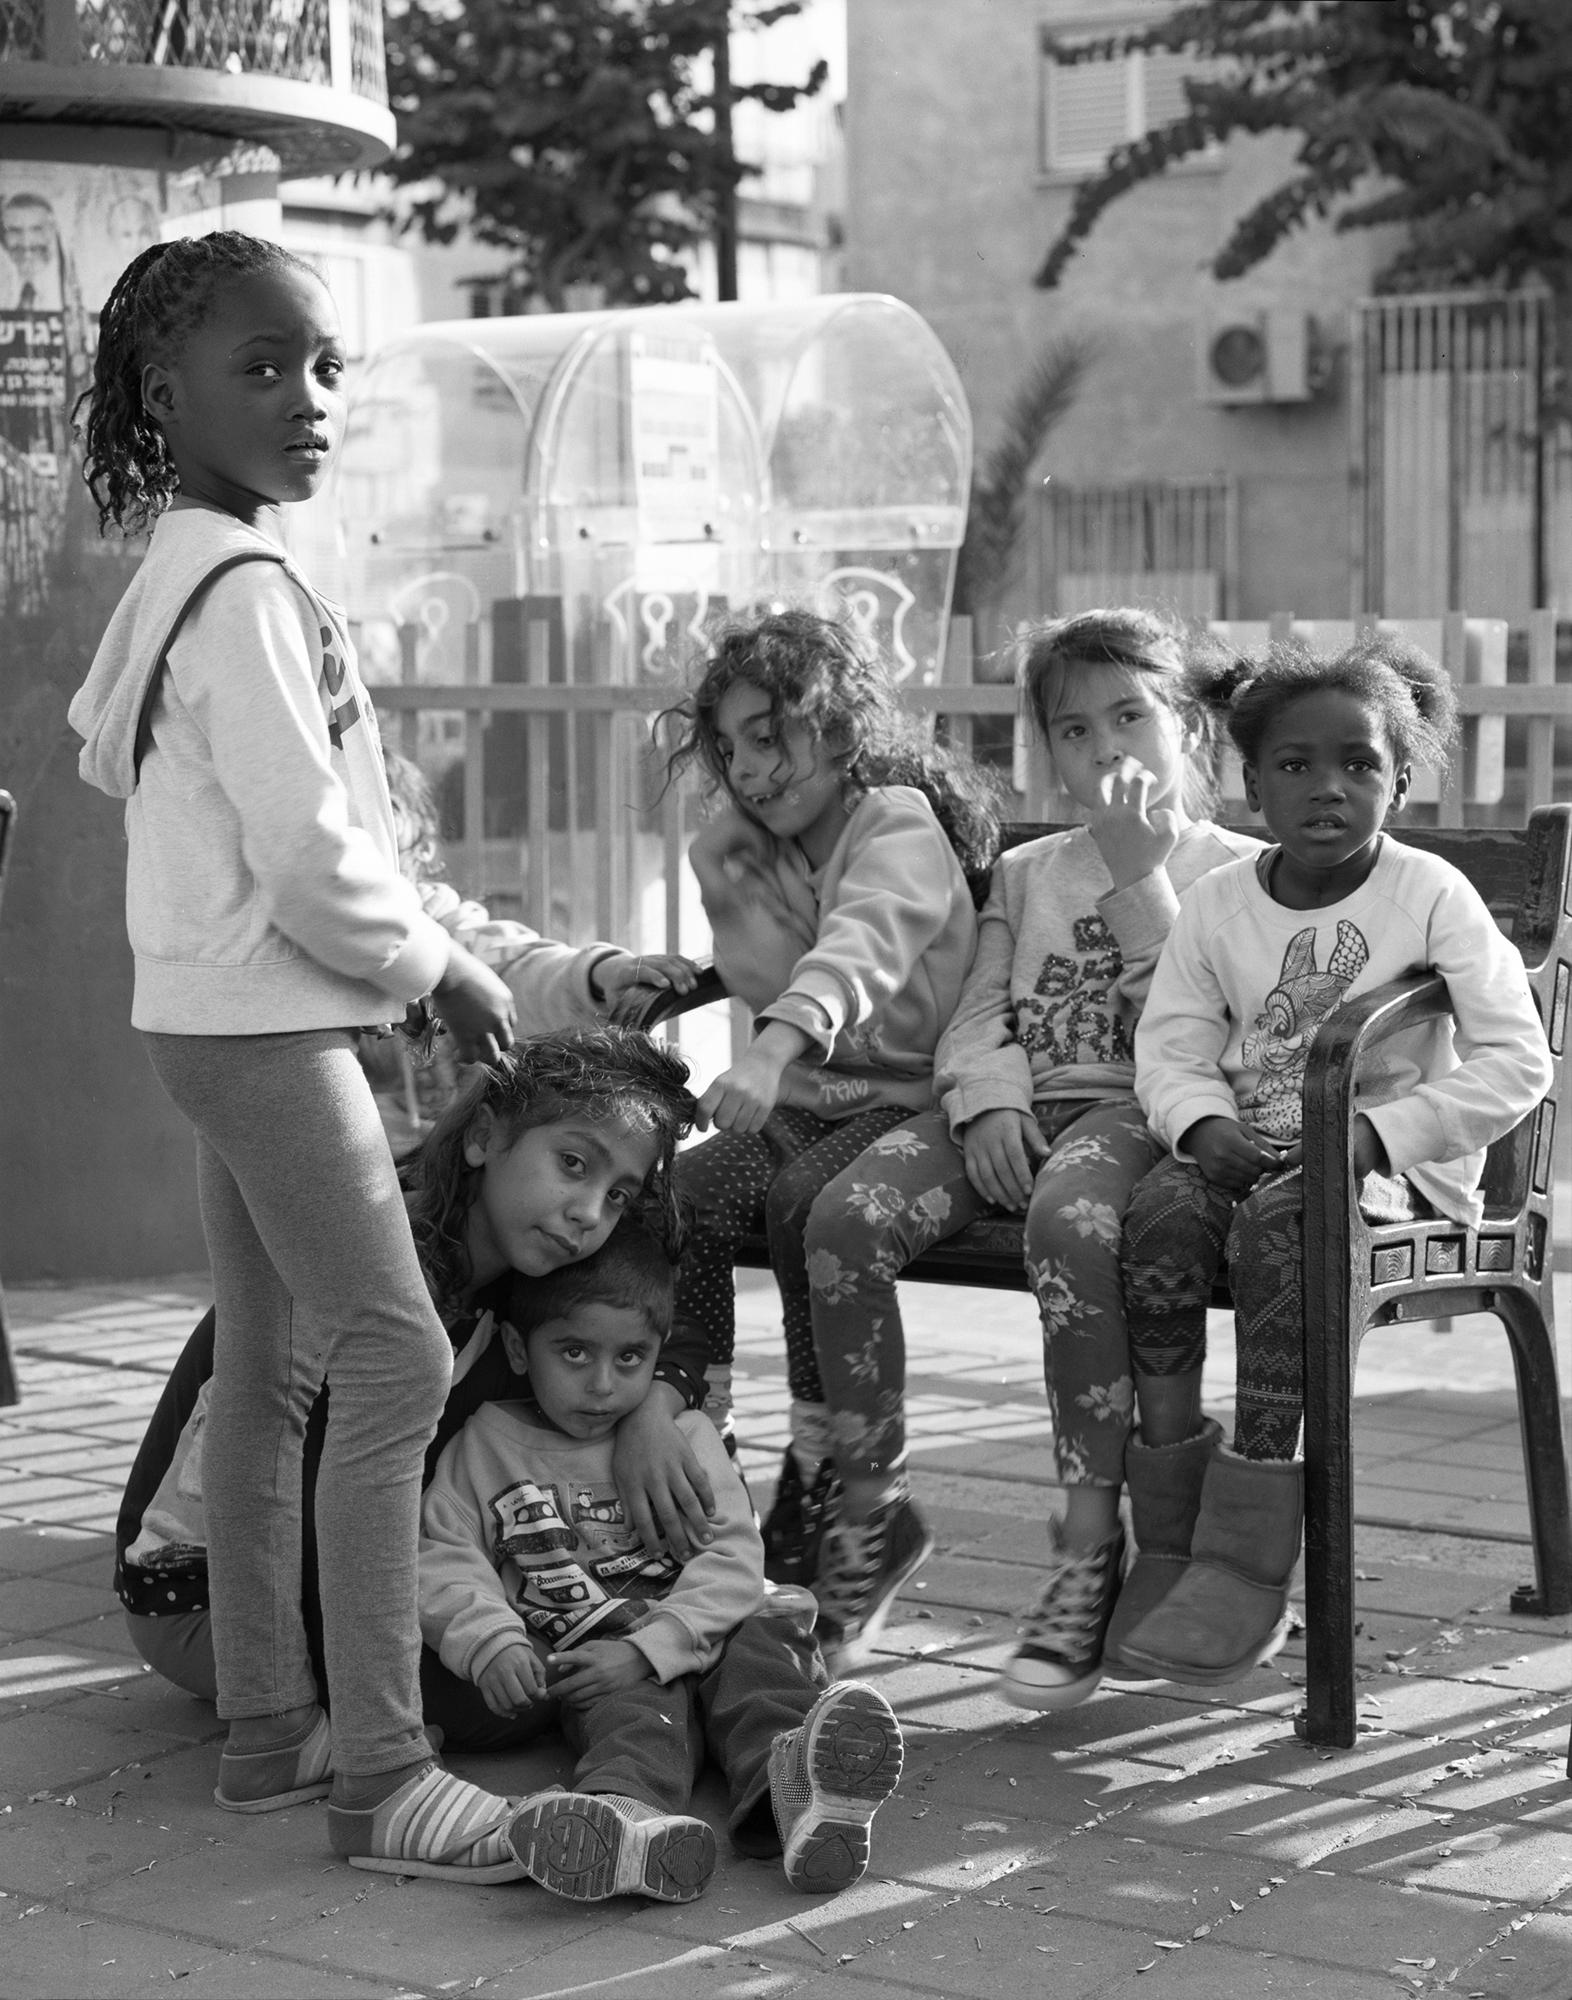 Kids in a public park, Neve Sha'anan, 2015